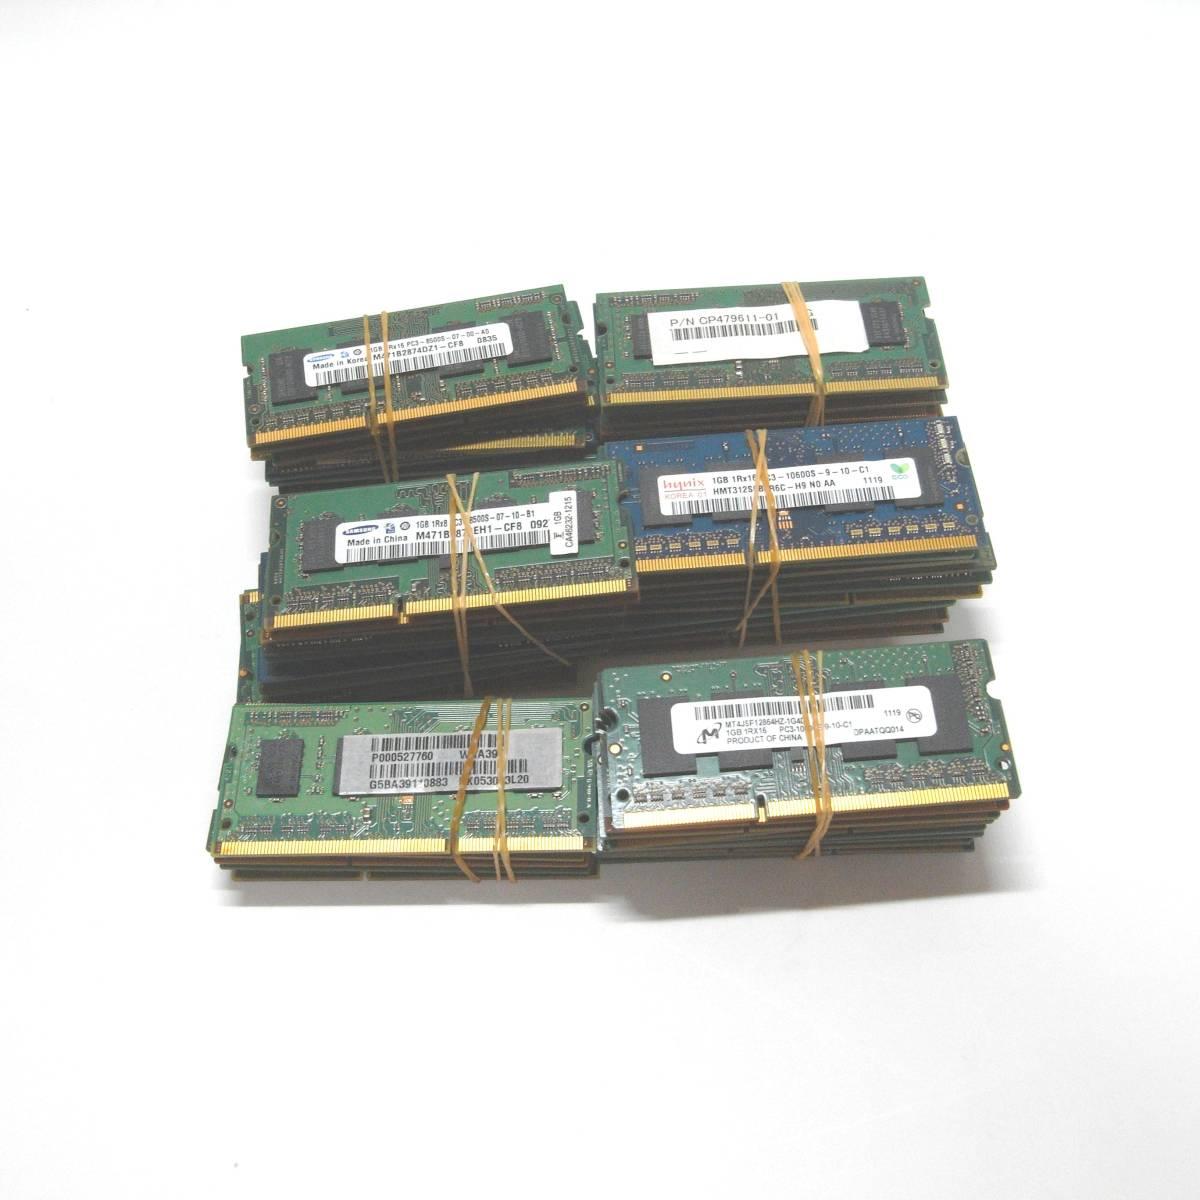 PC3-1GB DDR3 204ピン メーカ、スピード混在 55枚